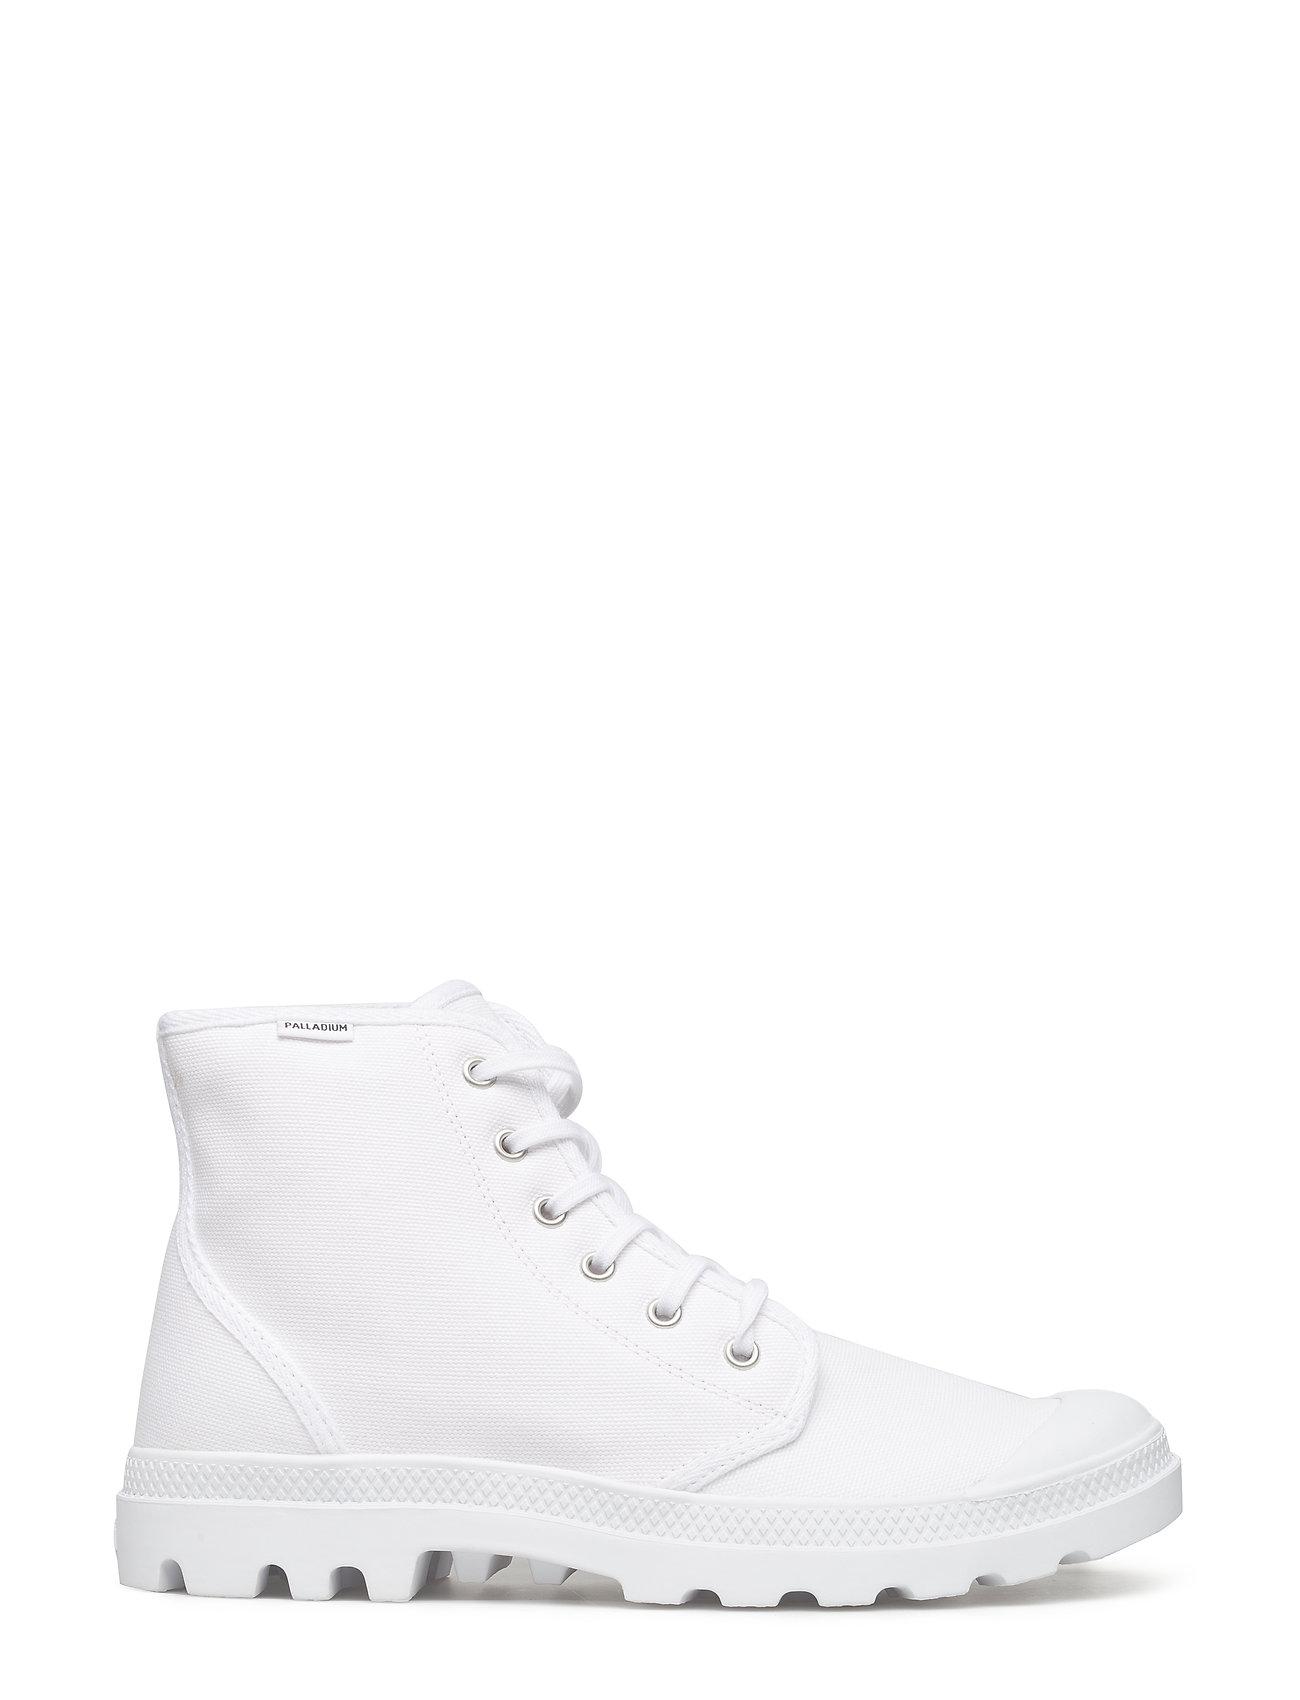 Pampa Hi Orginale High-top Sneakers Hvid Palladium